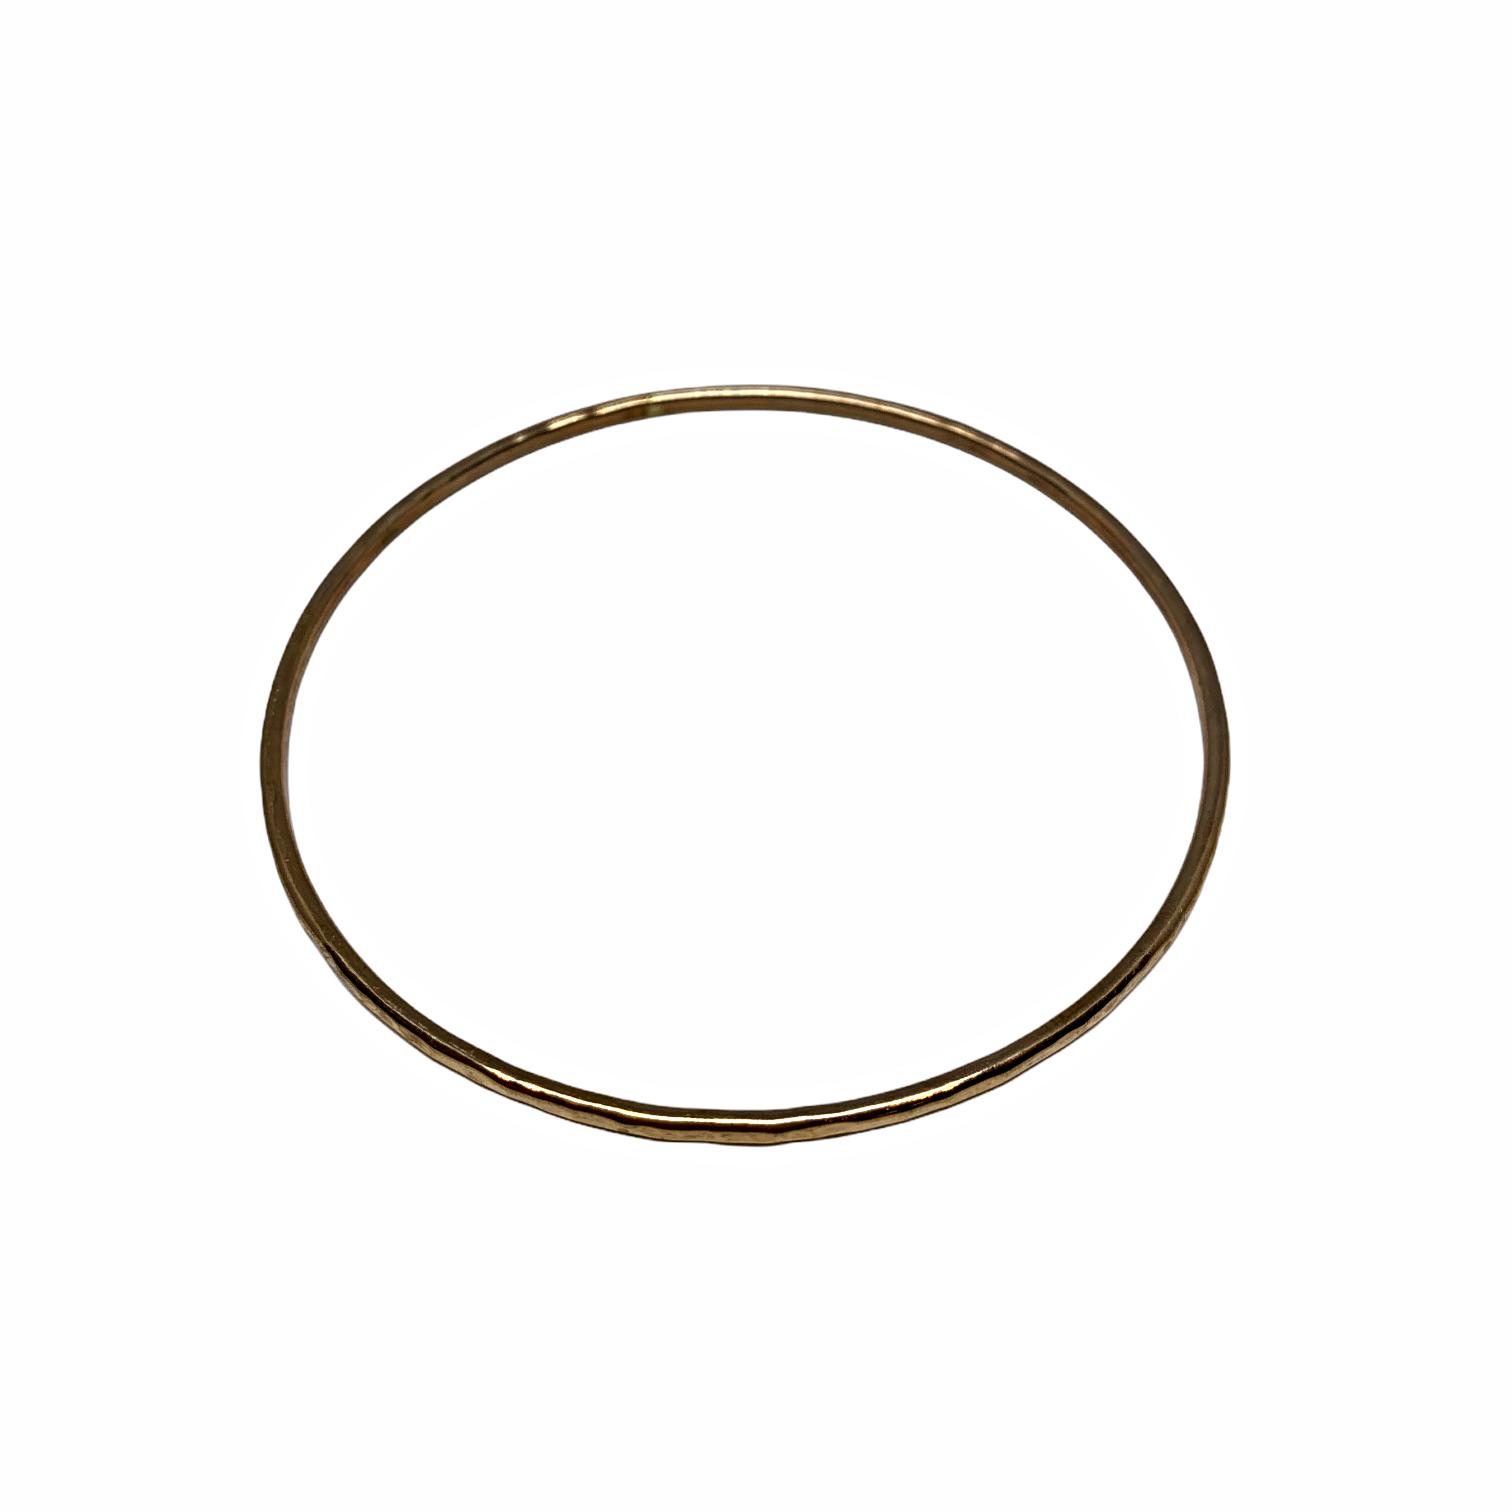 Handmade bronze bangle by Karyn Chopik   Effusion Art Gallery + Cast Glass Studio, Invermere BC